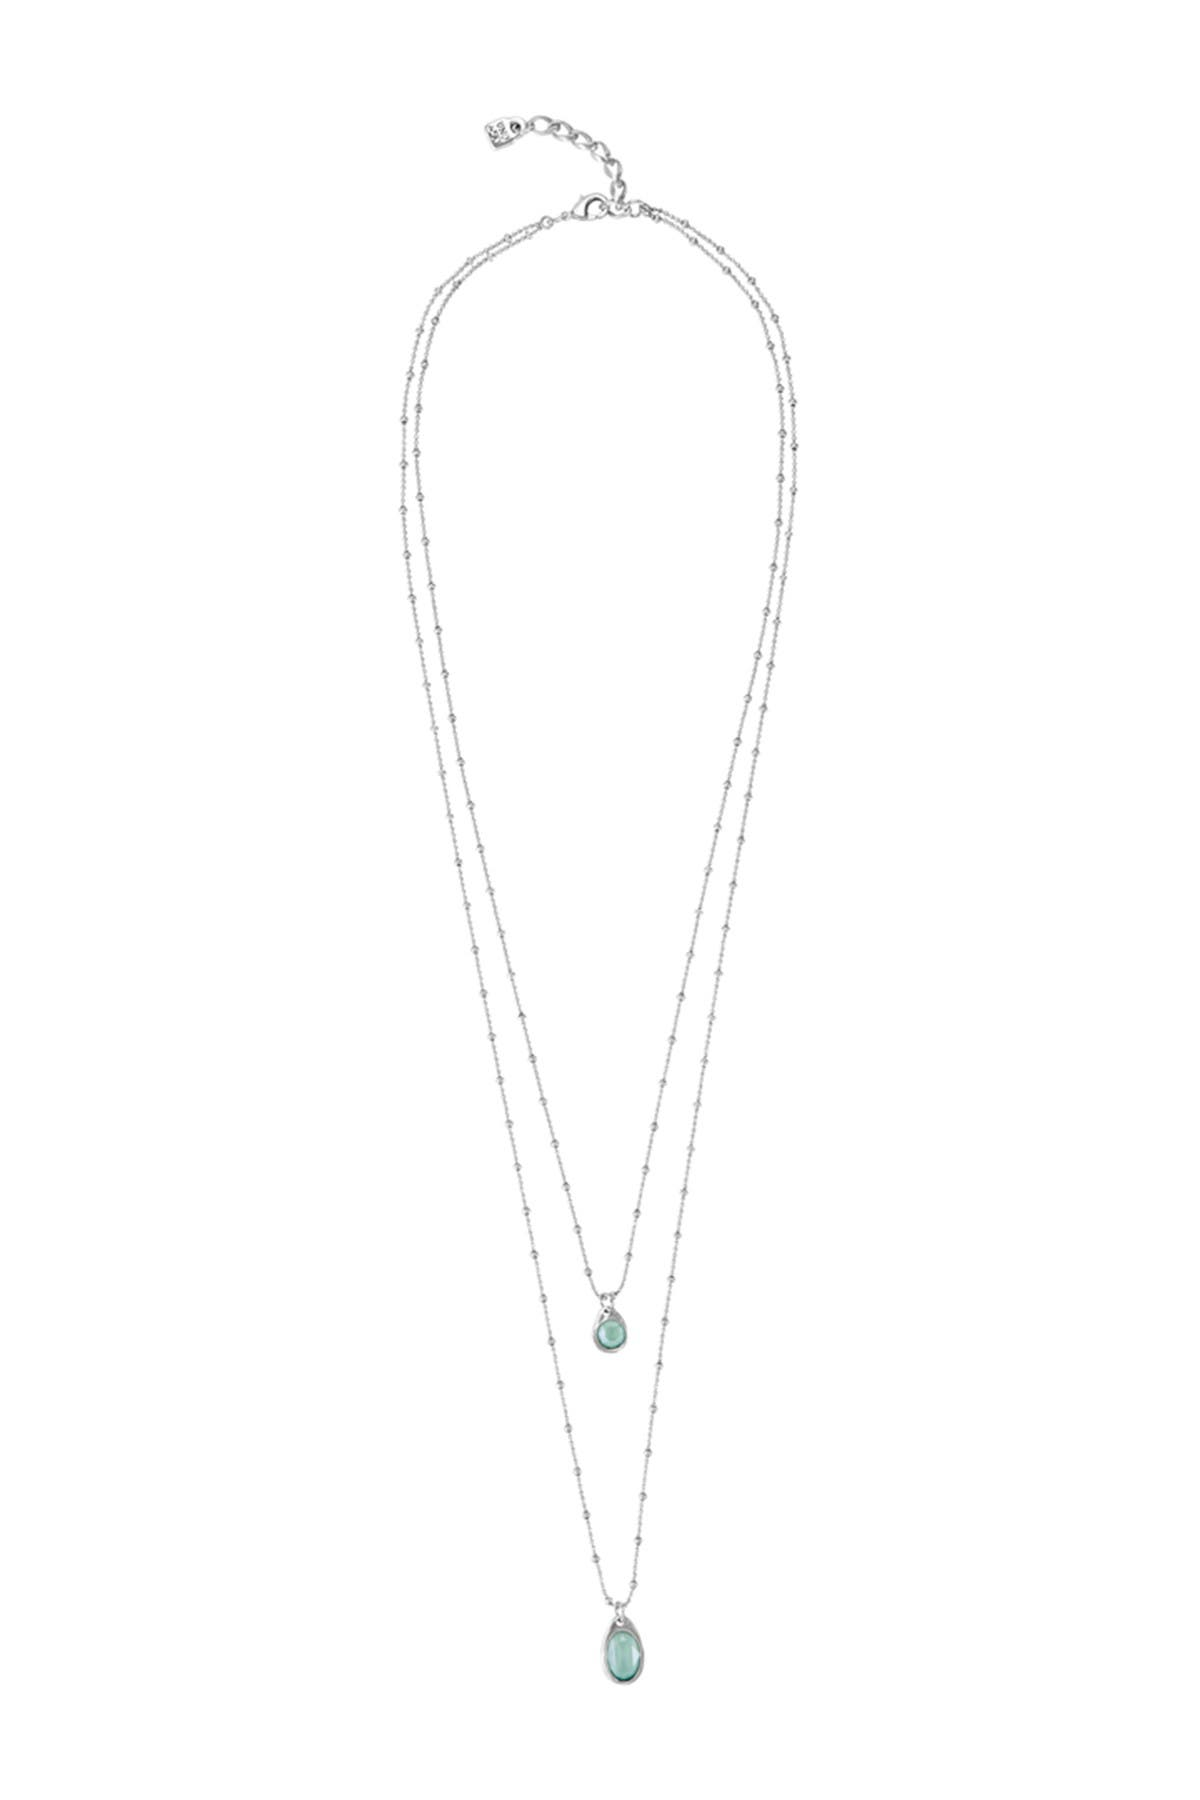 Image of Uno De 50 Wish Silver Plated Necklace